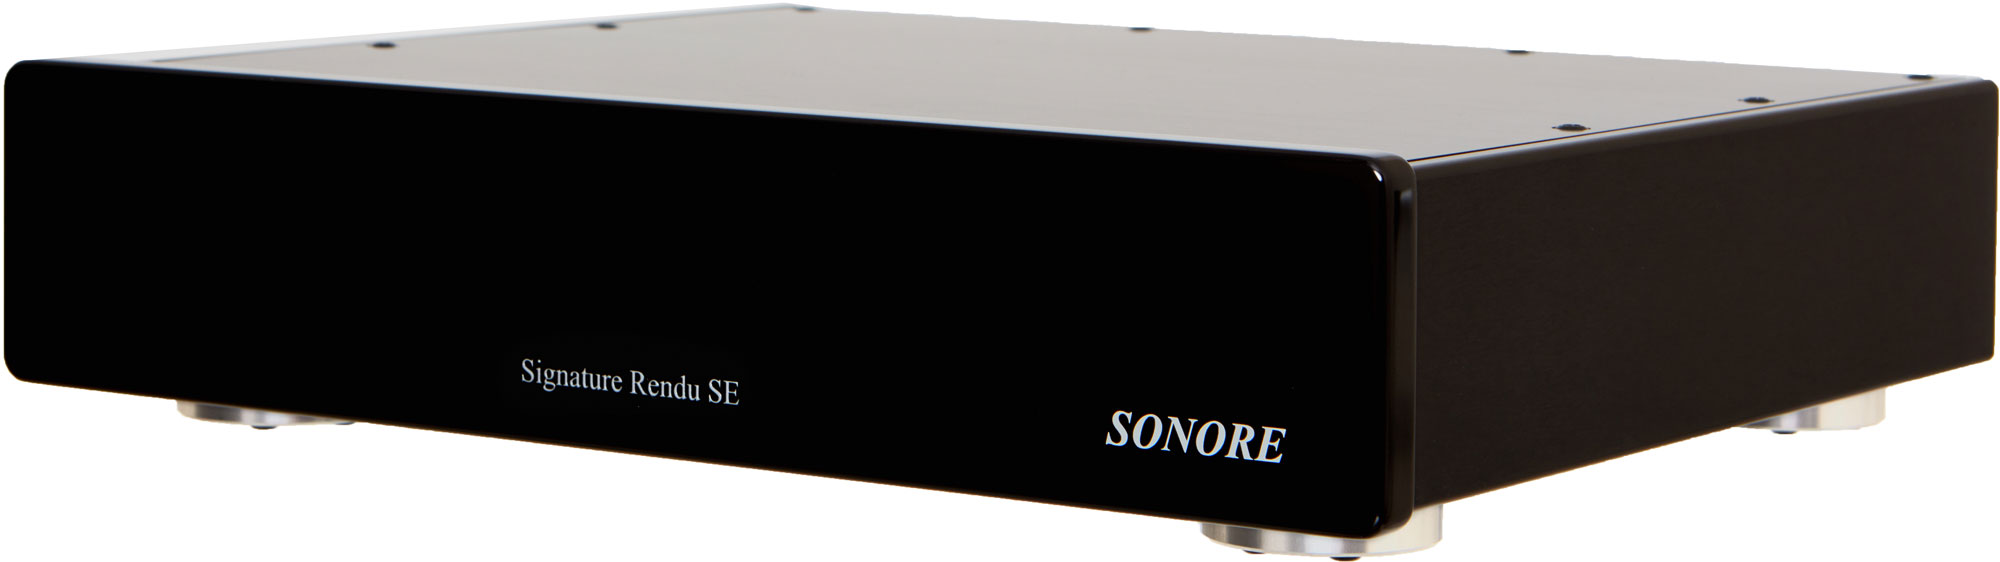 Sonore Signature Rendu SE & Small Green Computer sonicTransporter i7